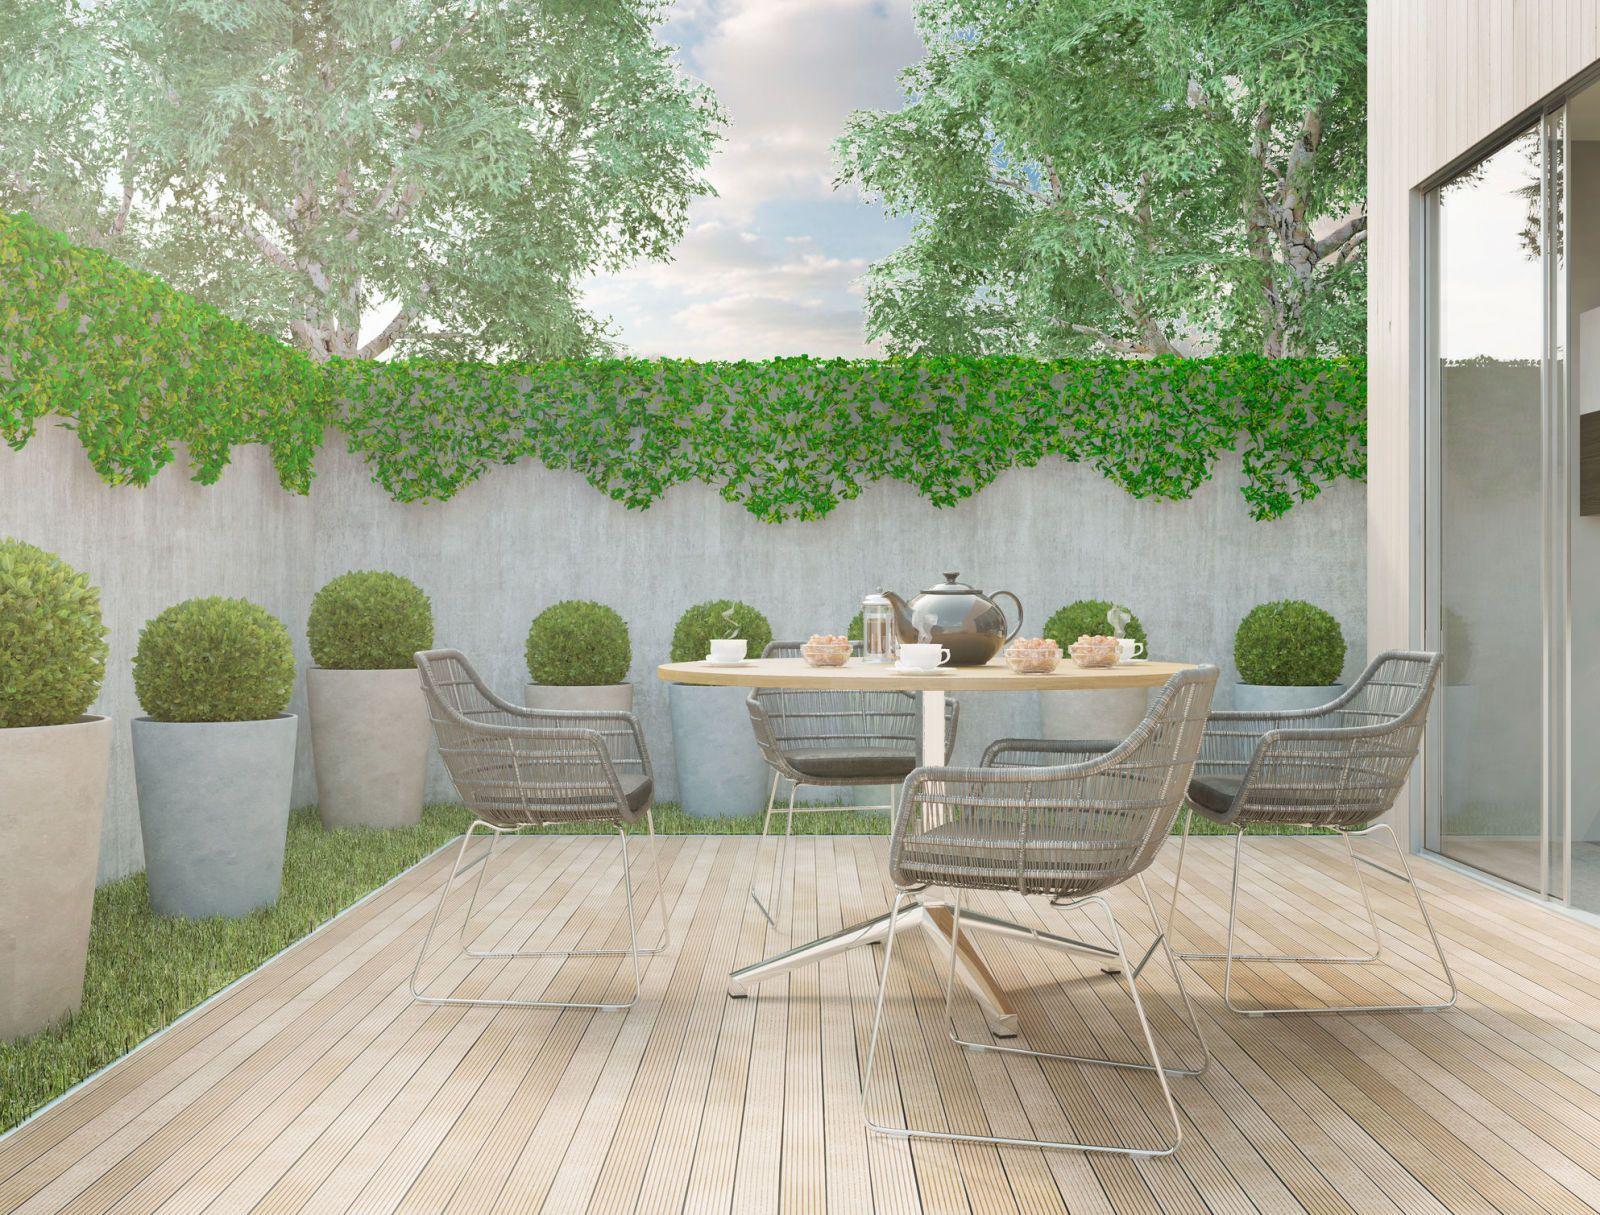 Modern Minimalistic Style Backyard Garden On A Sunny Day